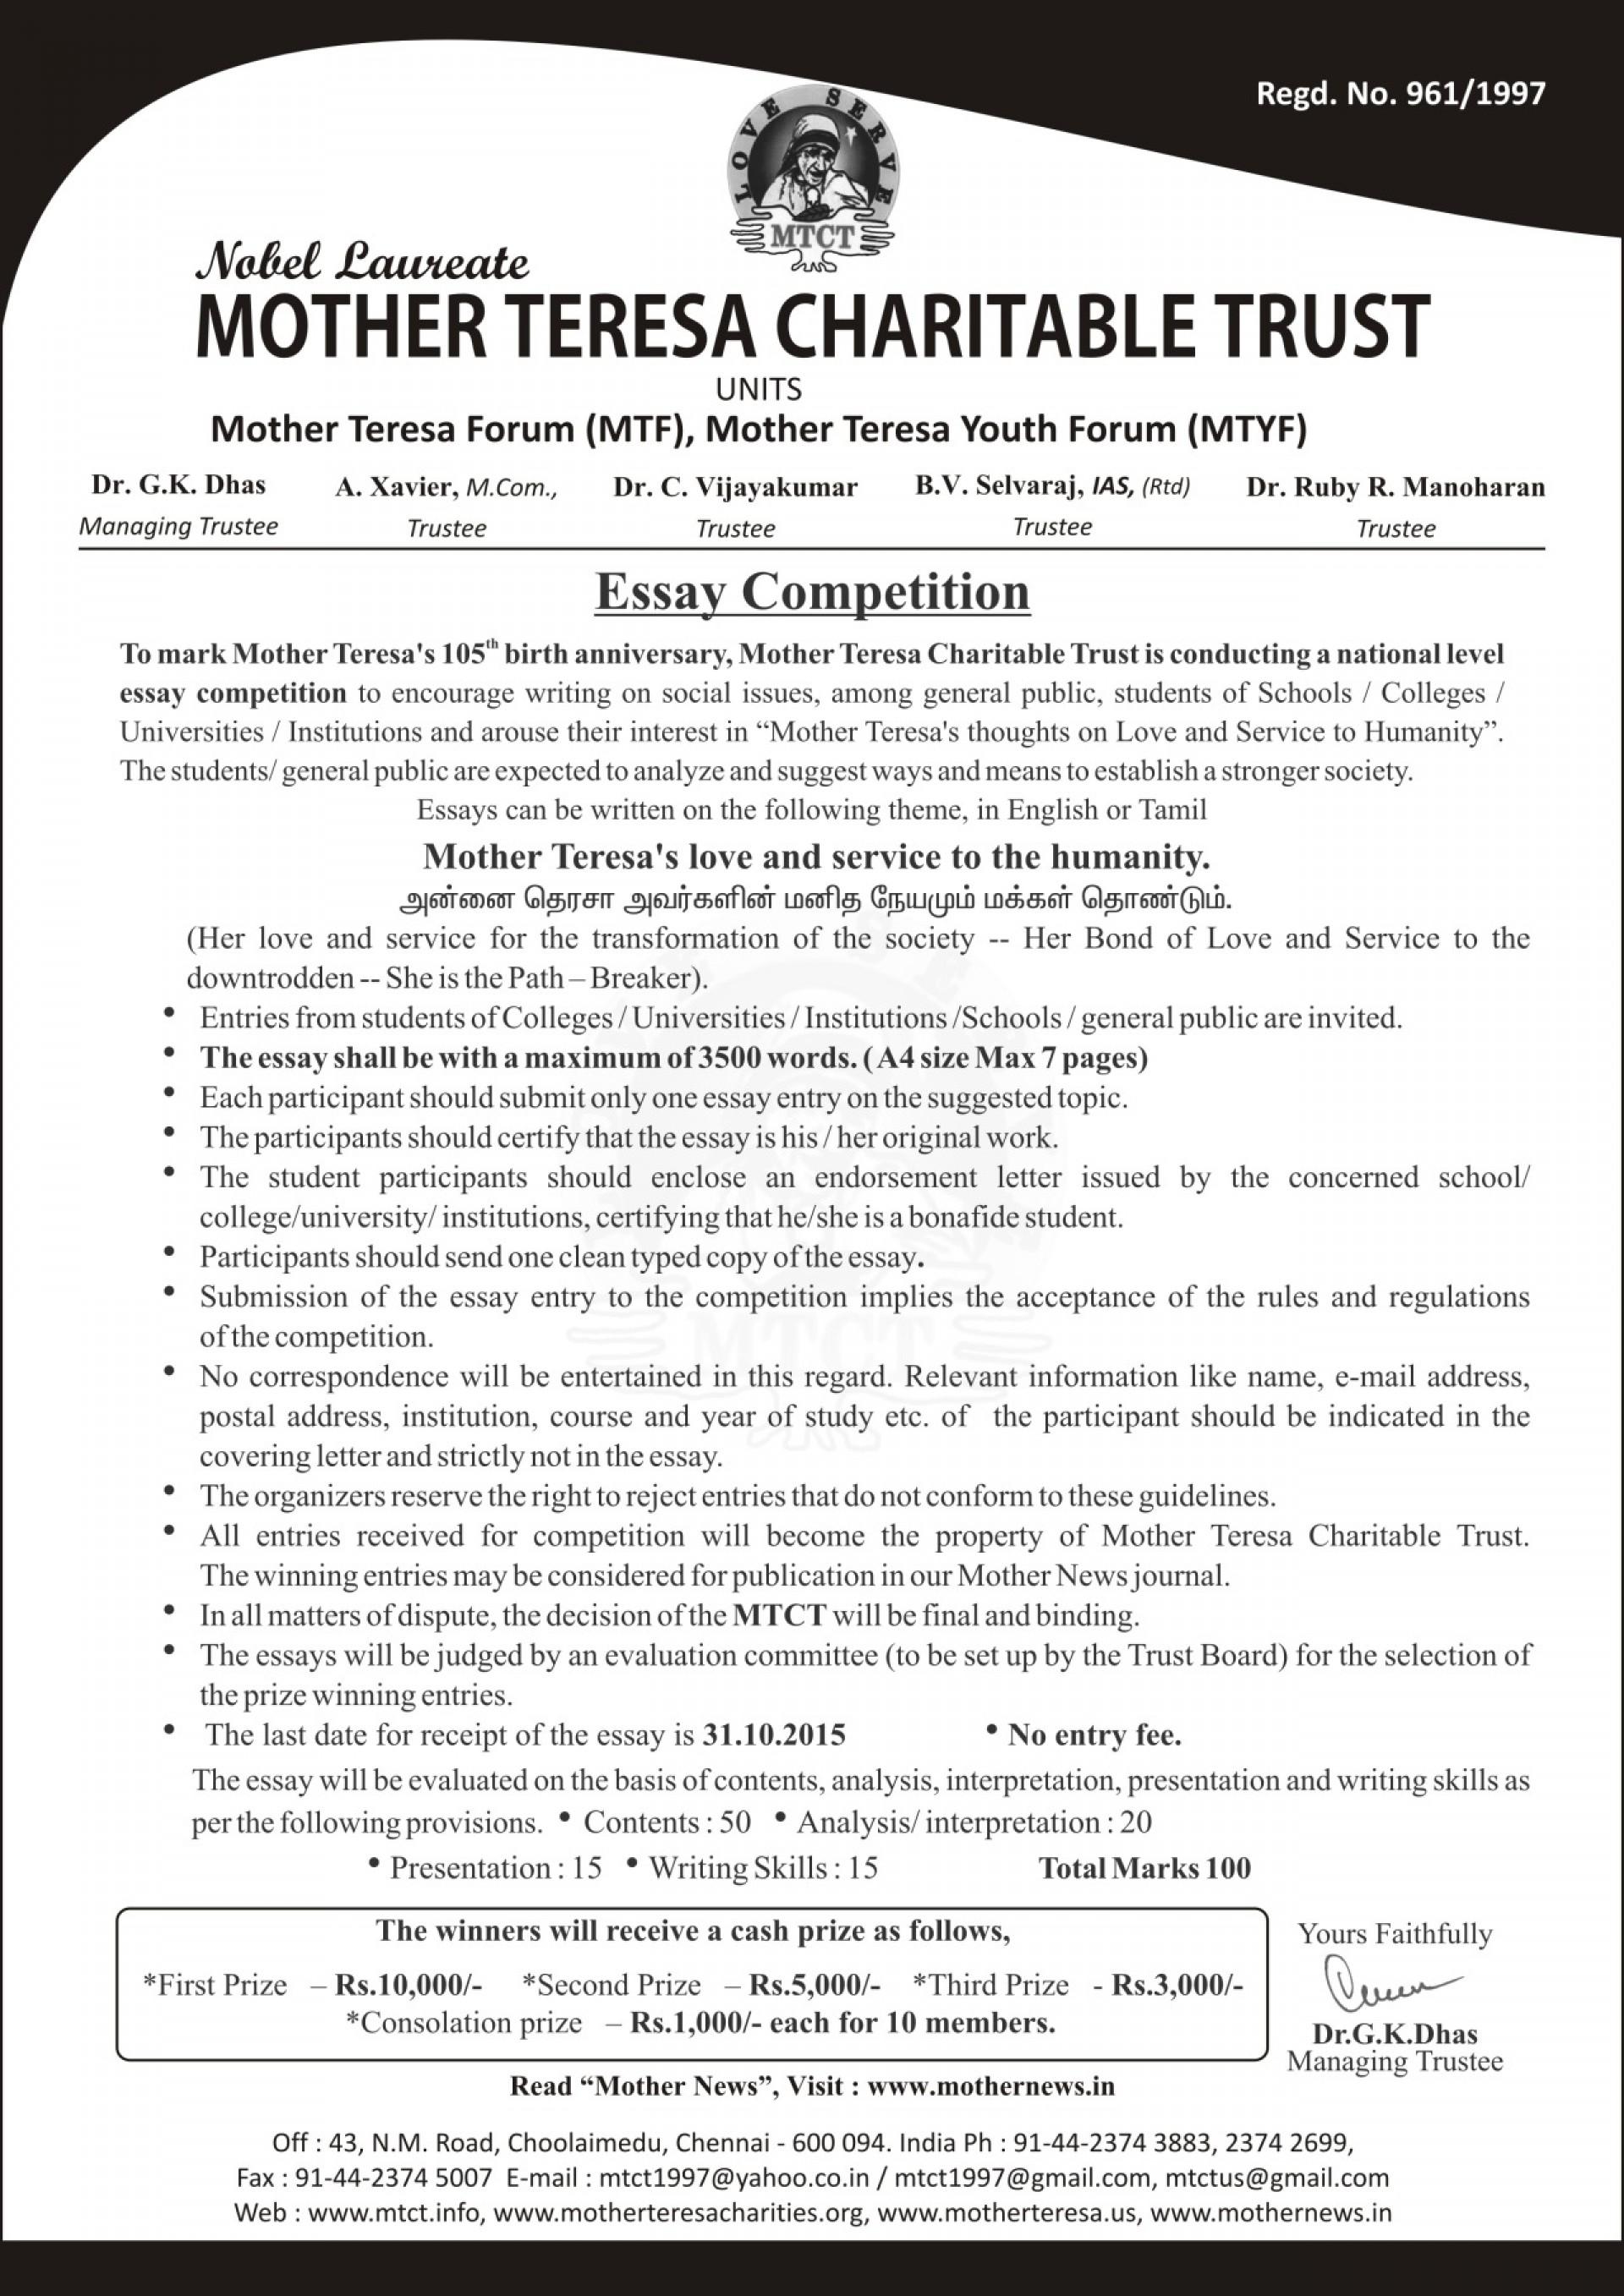 012 Trust Essay Tumblr Nv14i7scpj1ua8wu5o1 1280 Fantastic Topics In Hindi Essays Free 1920